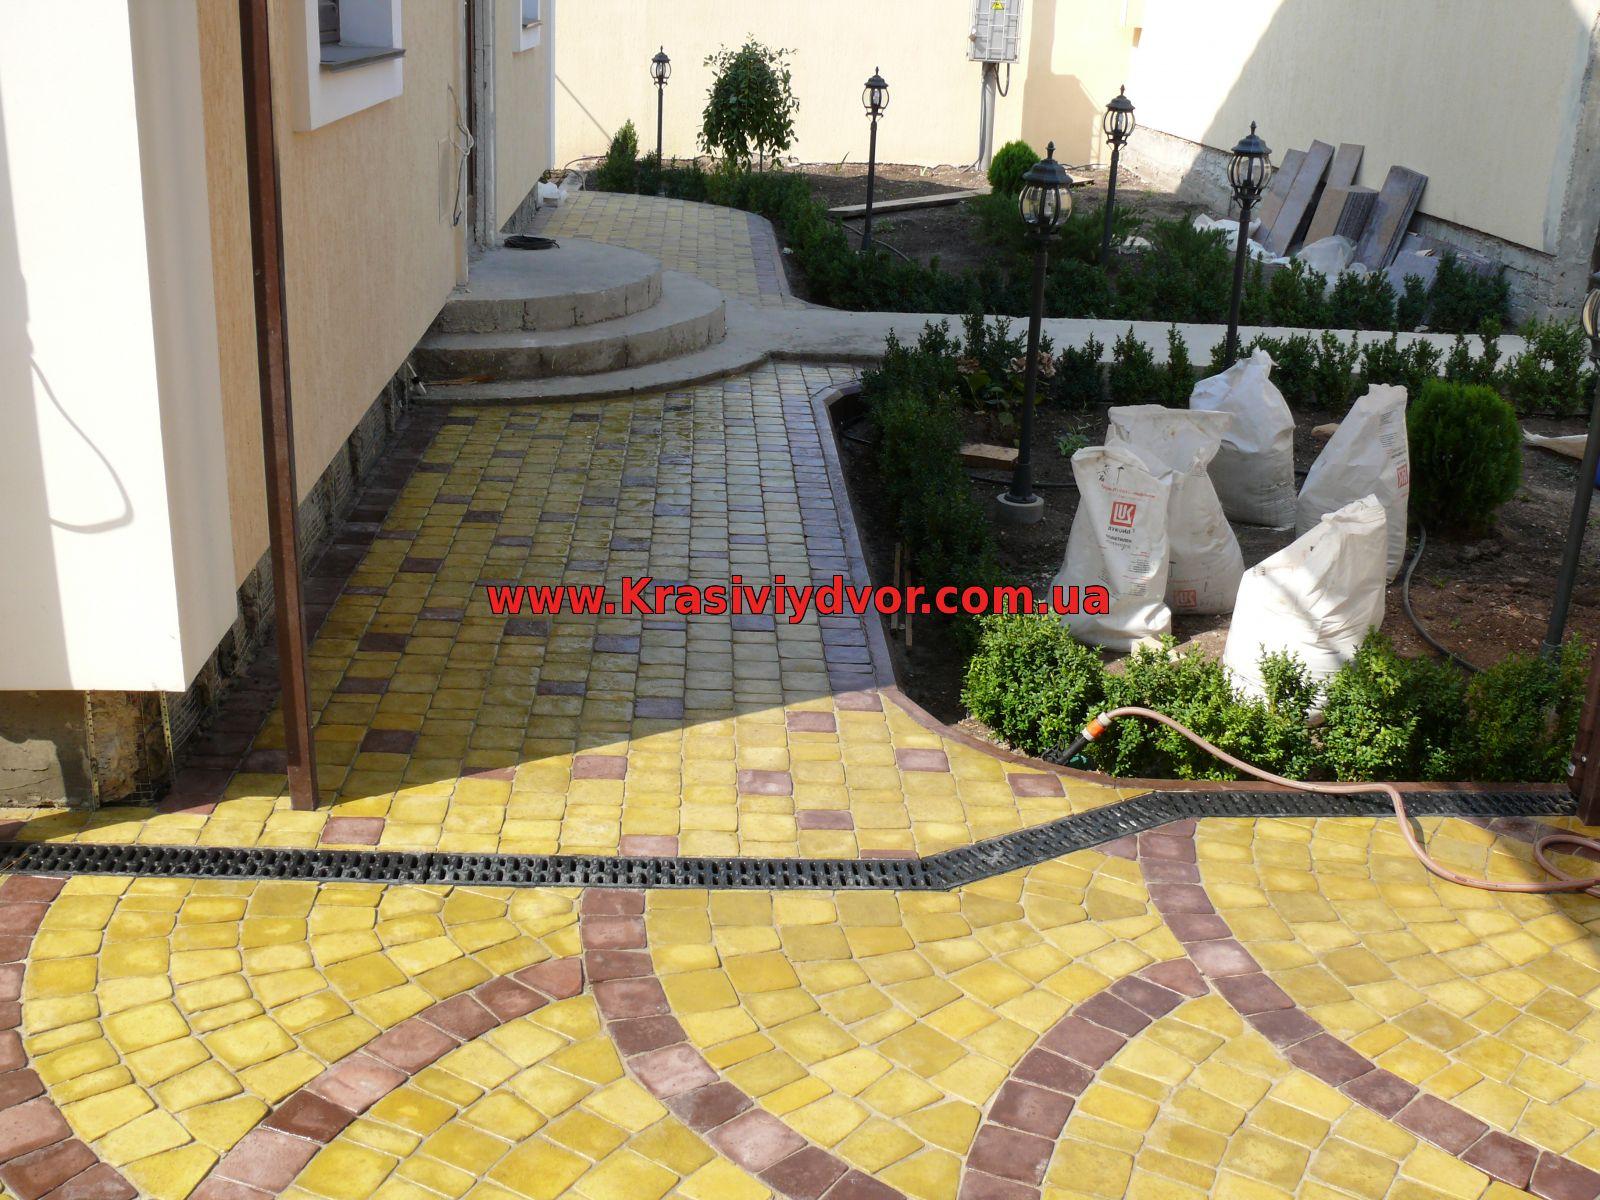 Дизайн тротуарной плитки домагалерея w=318